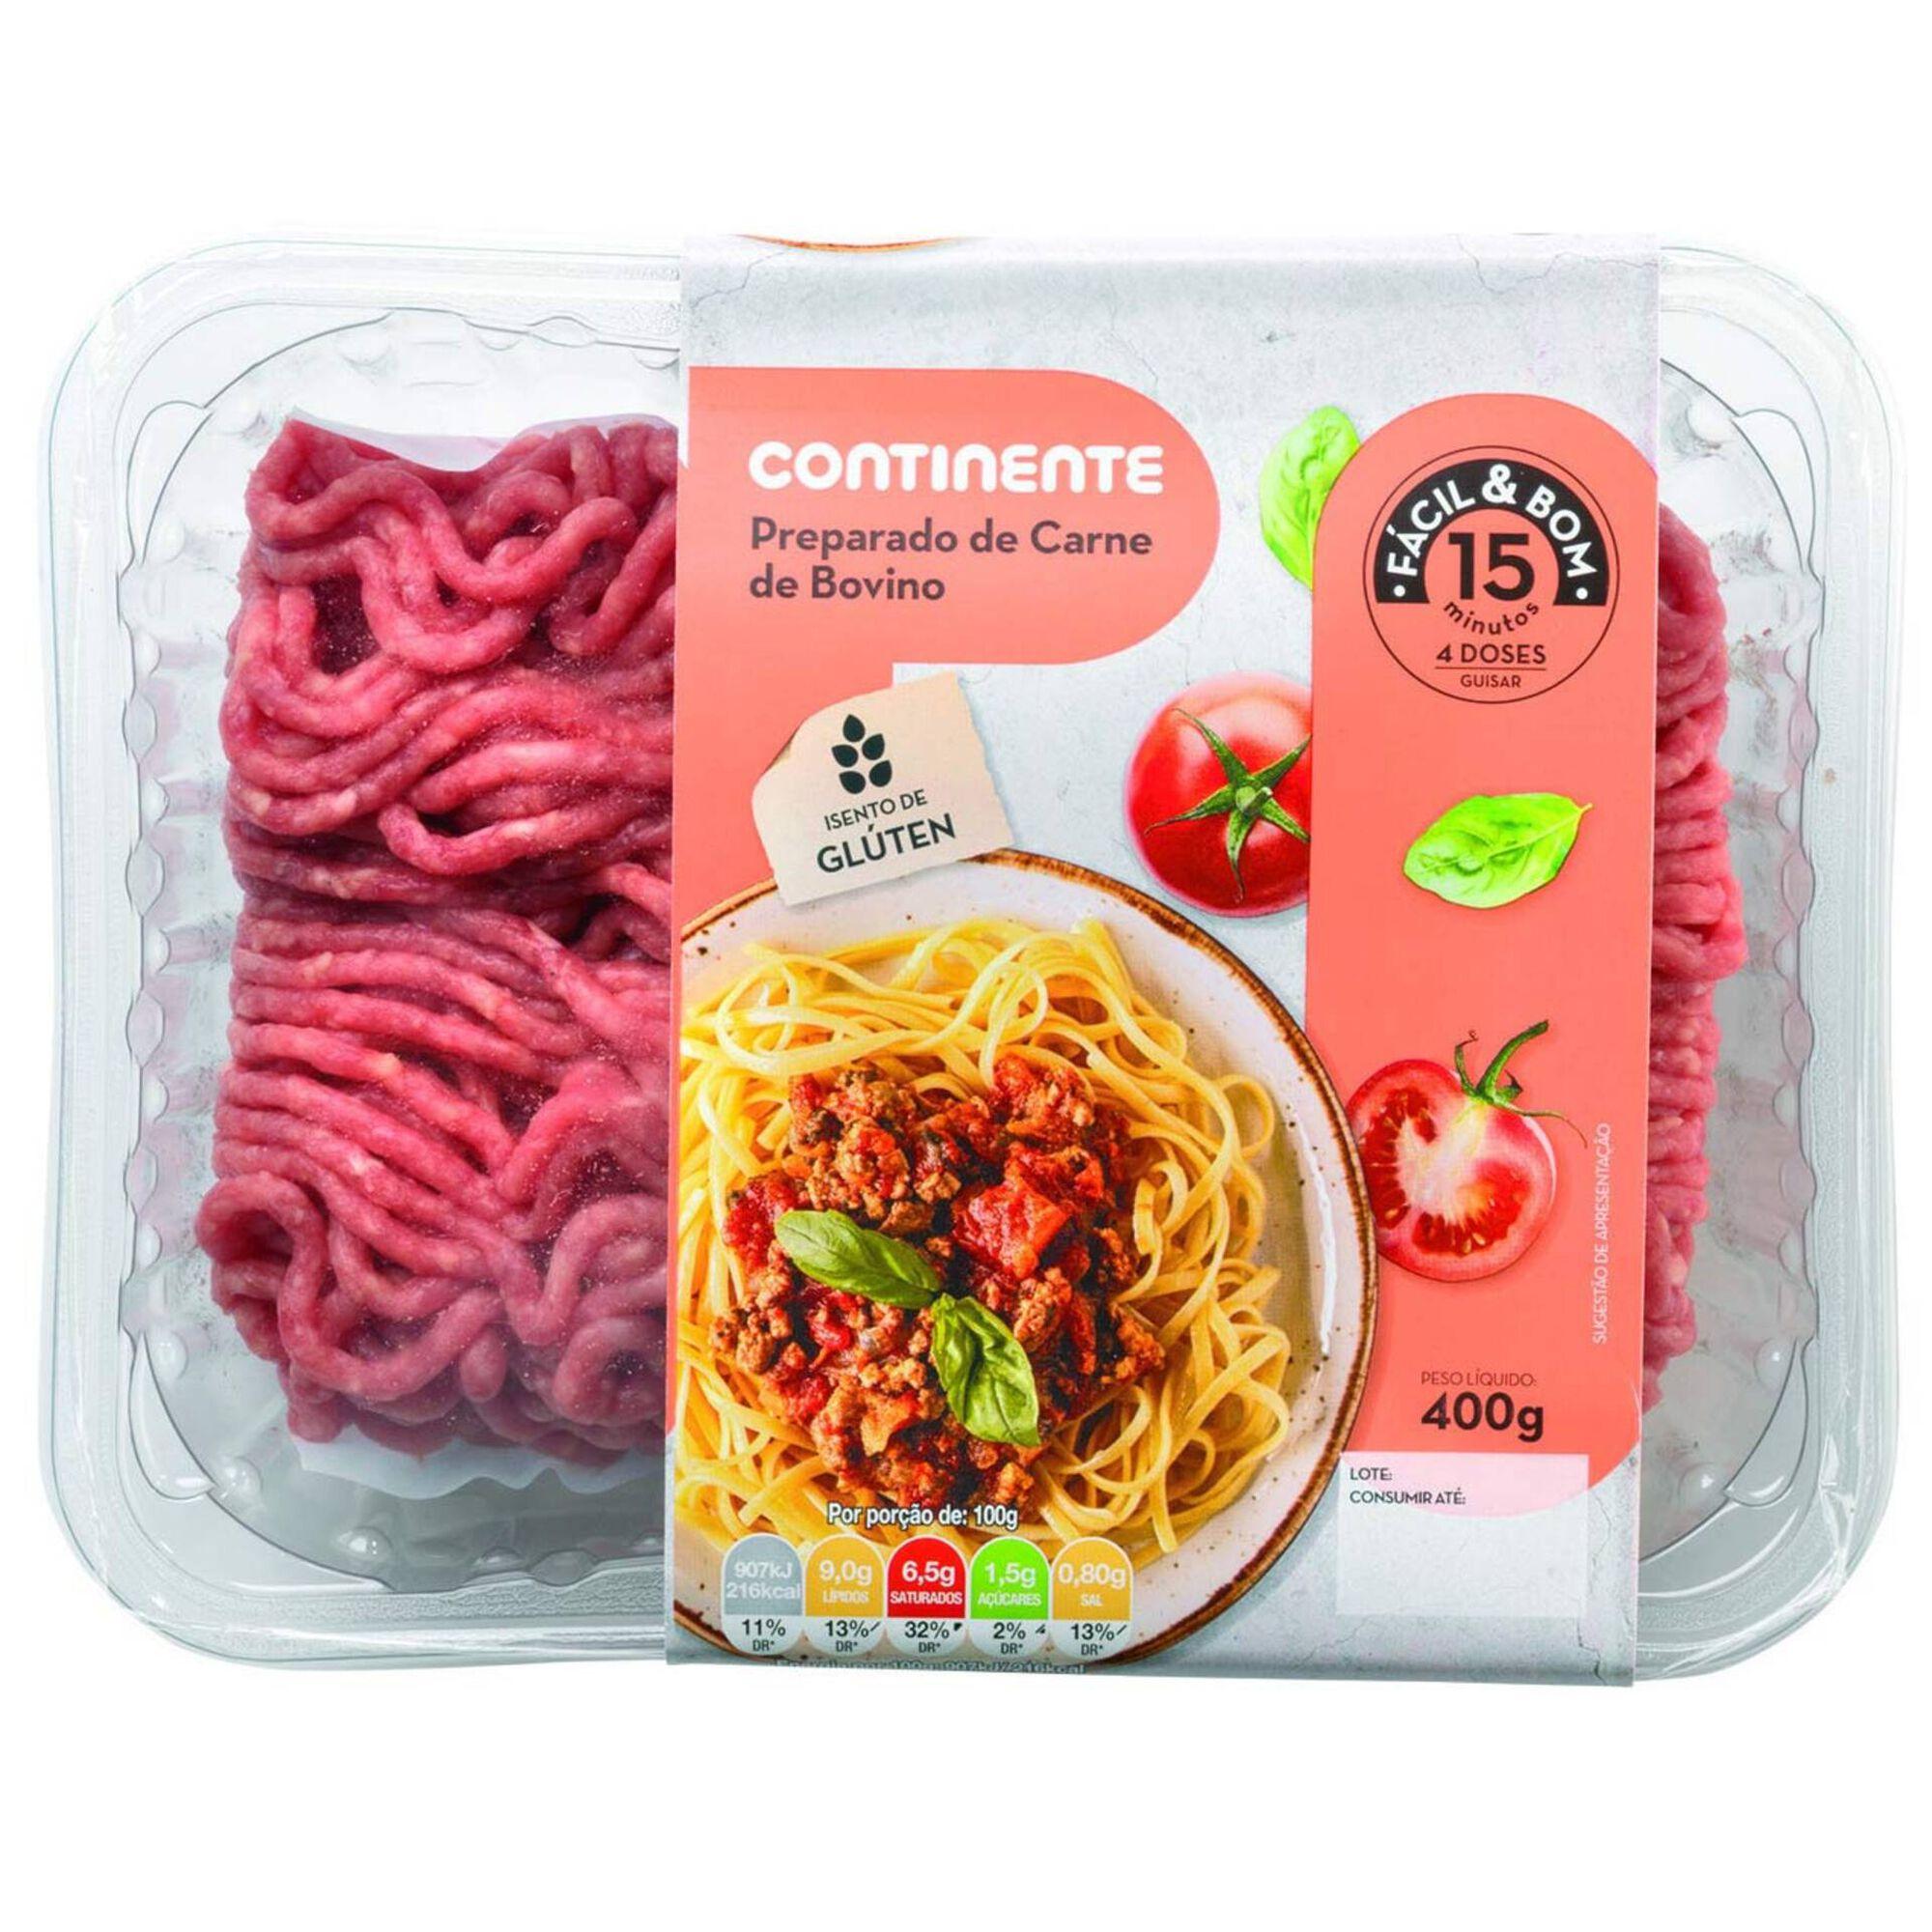 Carne Picada de Bovino